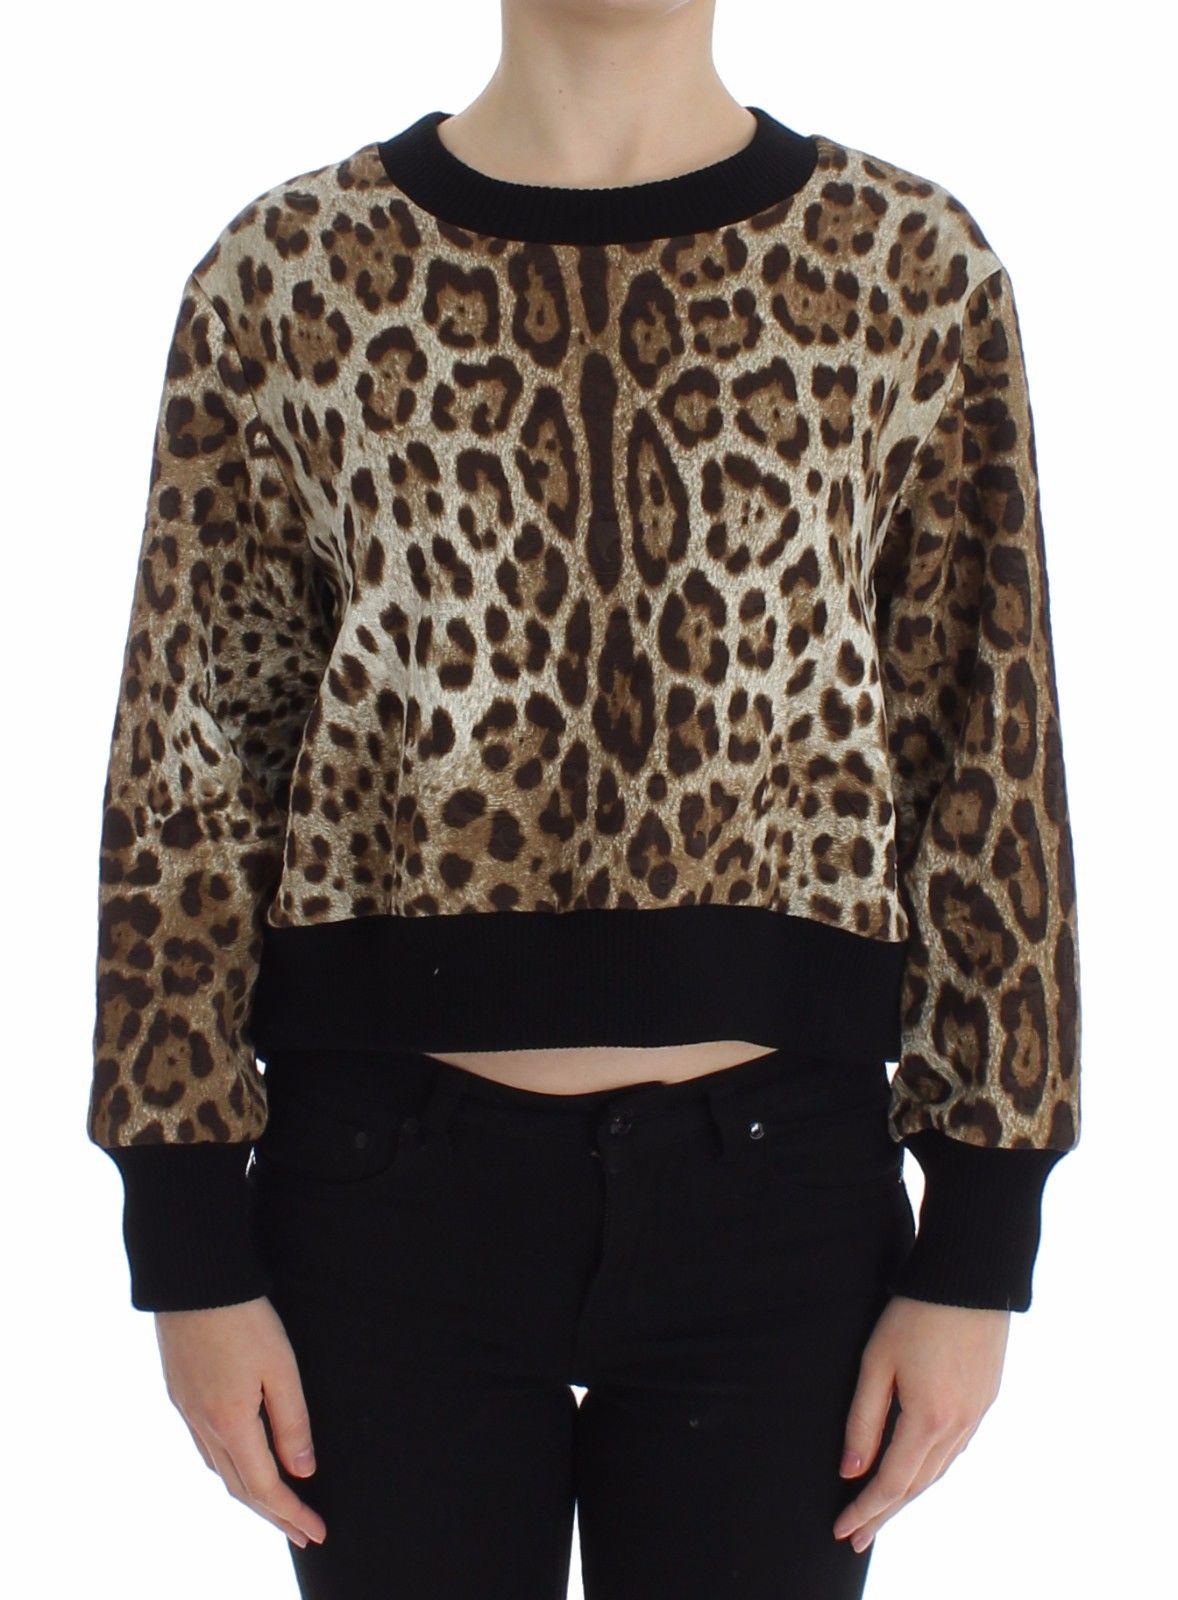 Dolce & Gabbana Women's Leopard Print Crewneck Short Sweater Brown SIG13185 - IT44|L